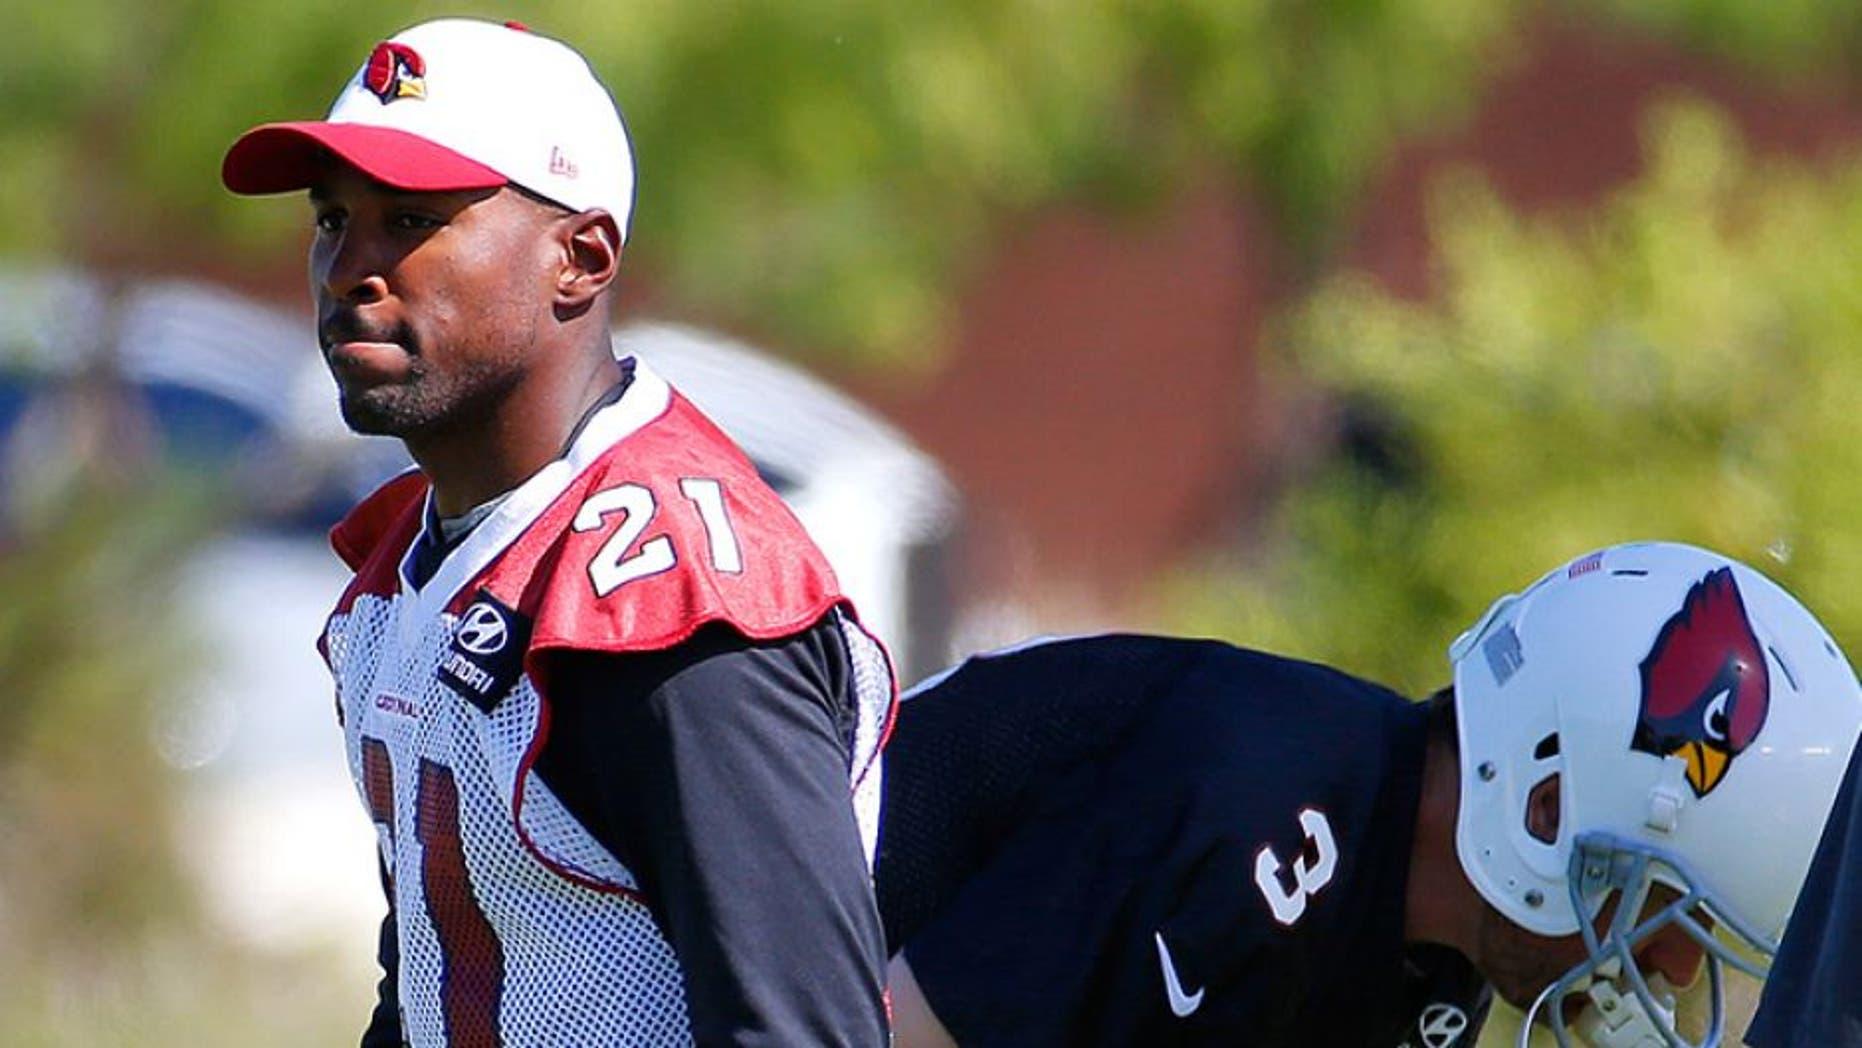 Arizona Cardinals' Patrick Peterson (21) arrives for an NFL football minicamp, Tuesday, June 7, 2016, in Tempe, Ariz. (AP Photo/Matt York)